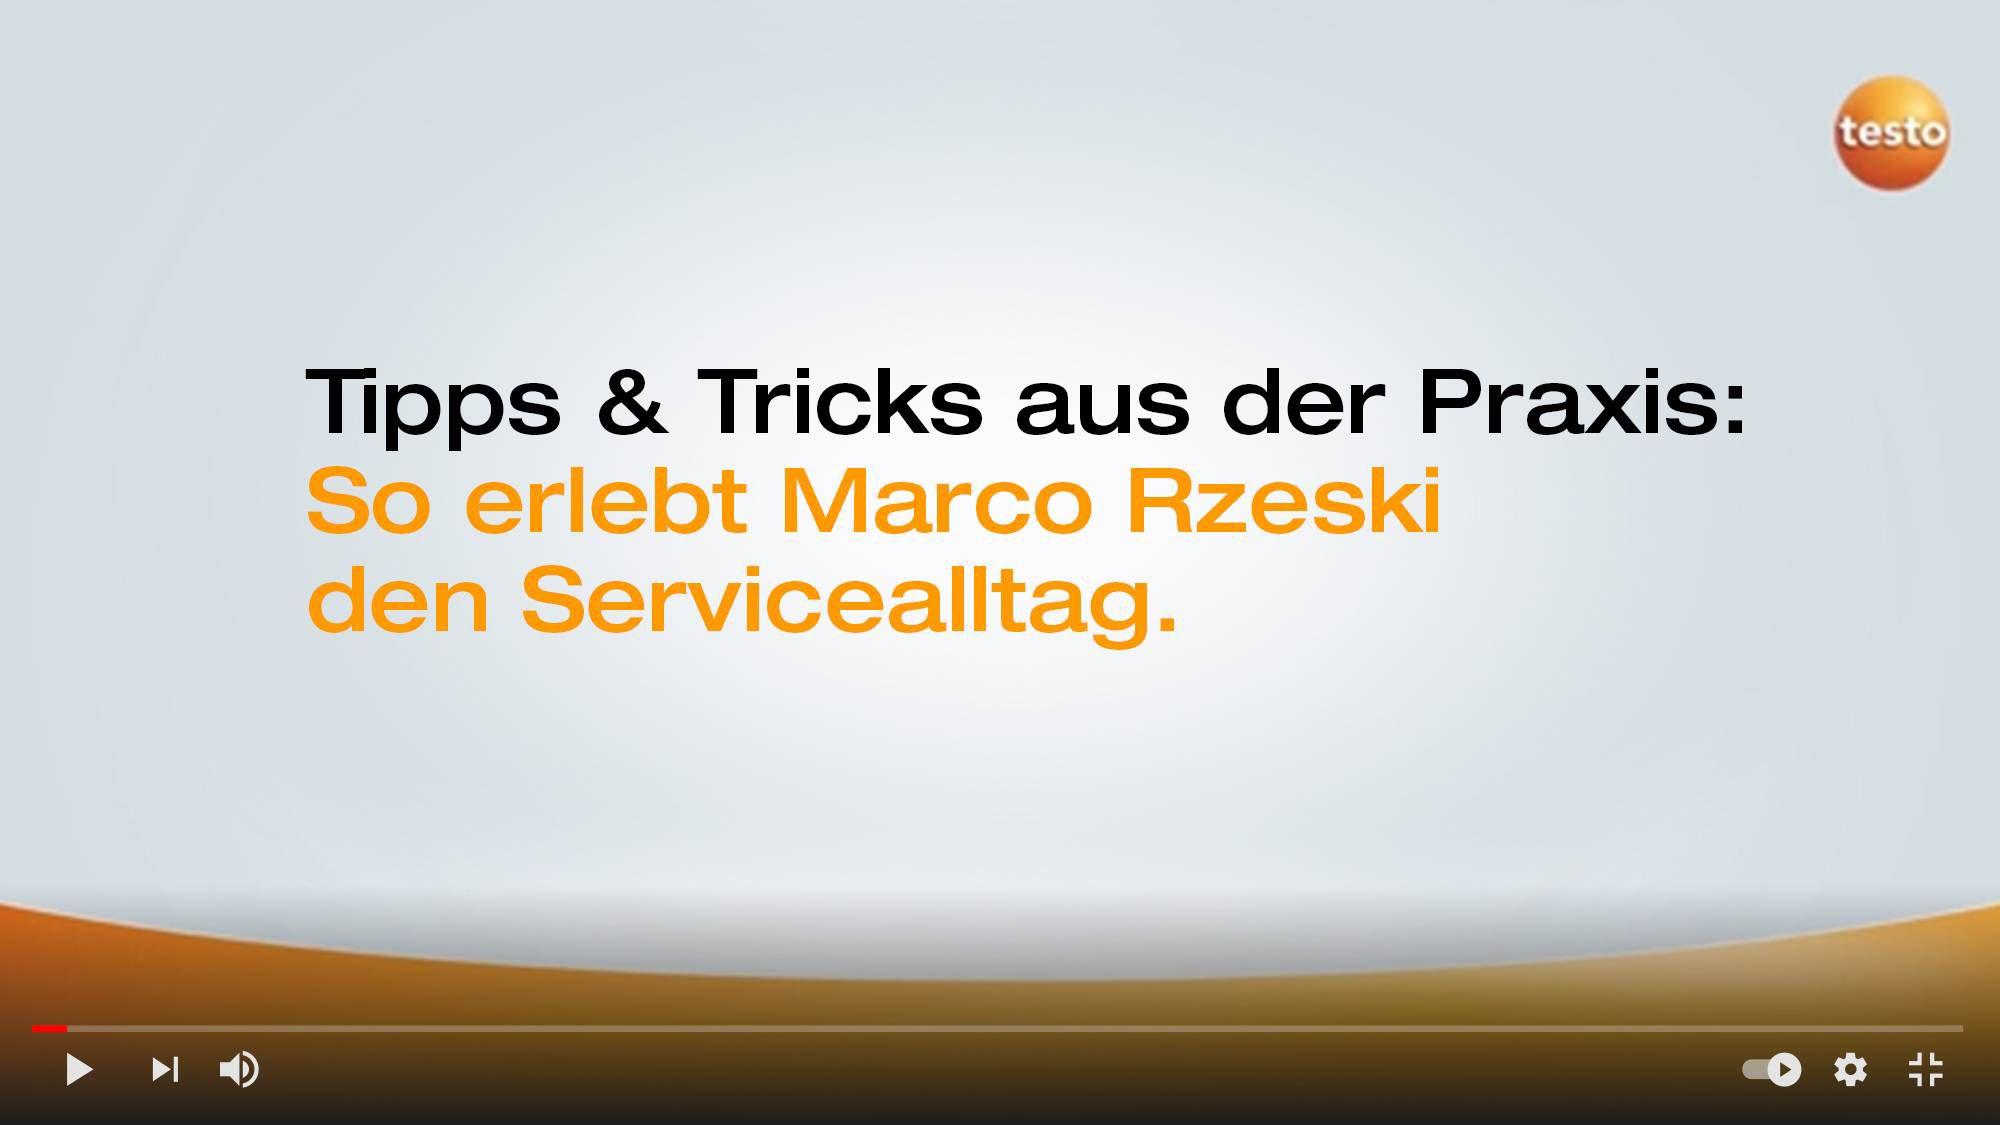 i-hv-sp-Heating-2021-Herbstaktion_Marco-Rzeski_Service-Talk_Text02_2000x1125px.jpg